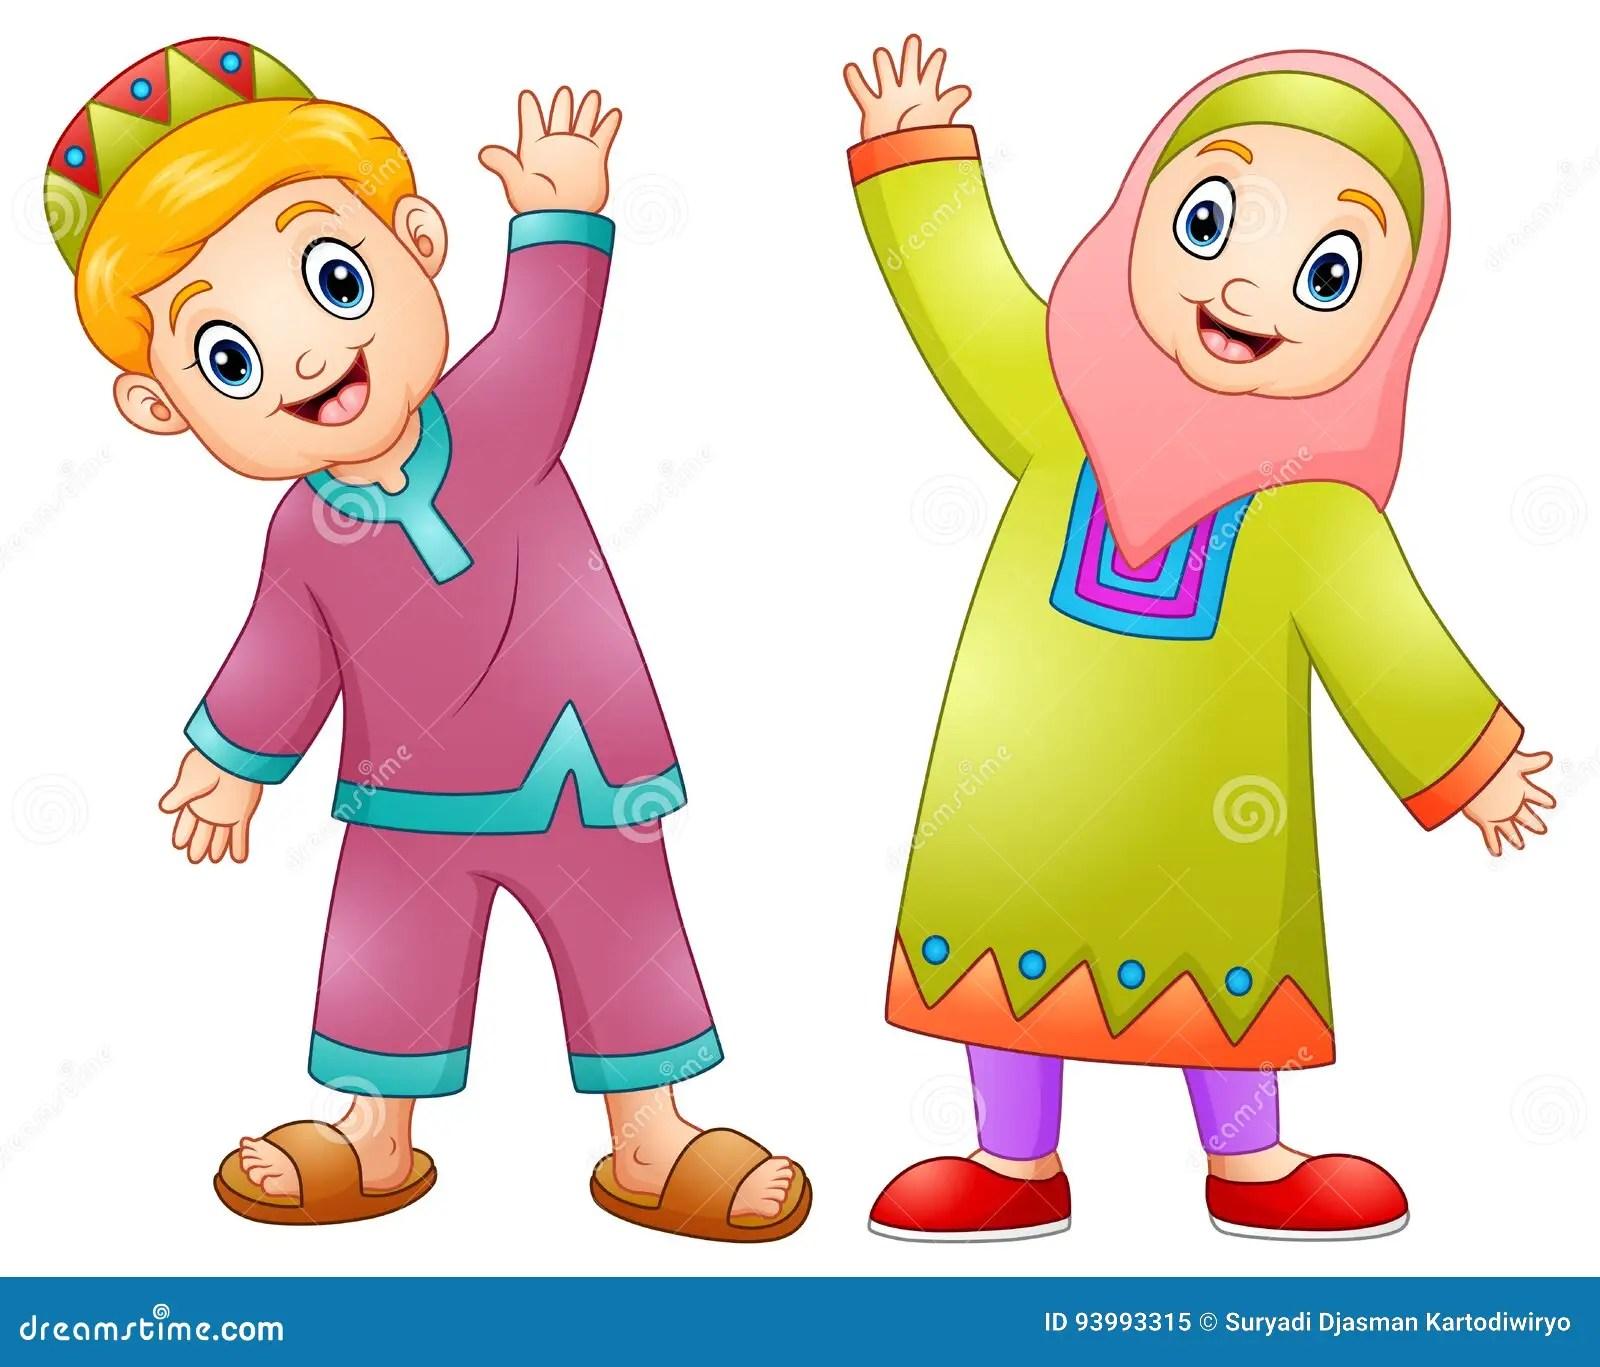 Wallpaper Cartoon Islamic Girl Happy Muslim Kids Cartoon For Celebrate Eid Mubarak Stock